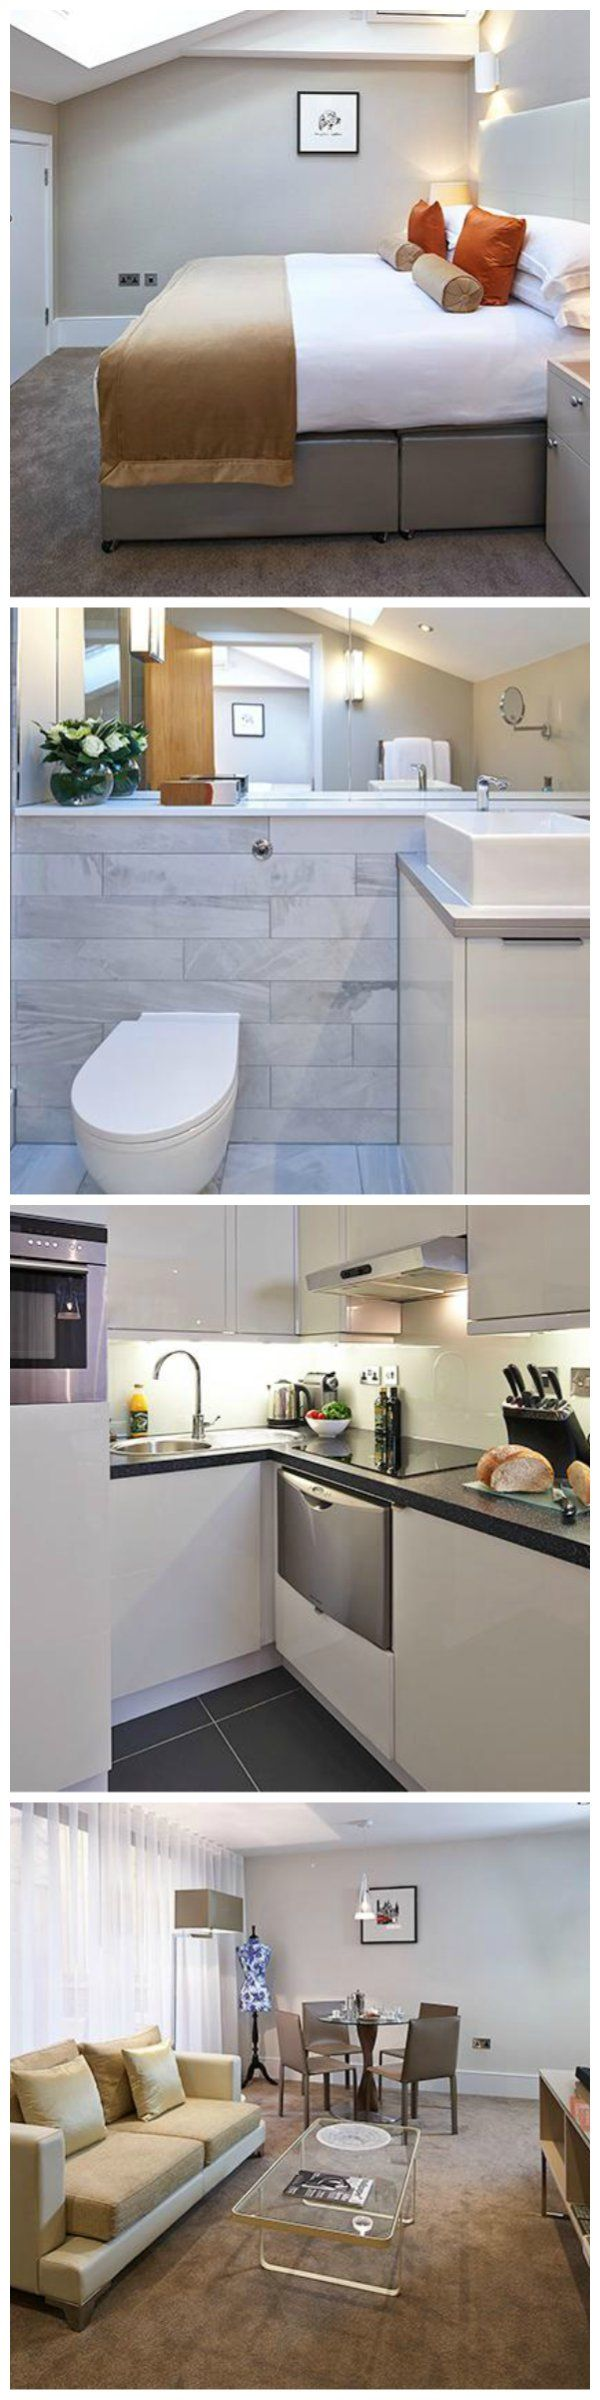 Más de 1000 ideas sobre apartment size dishwasher en pinterest ...